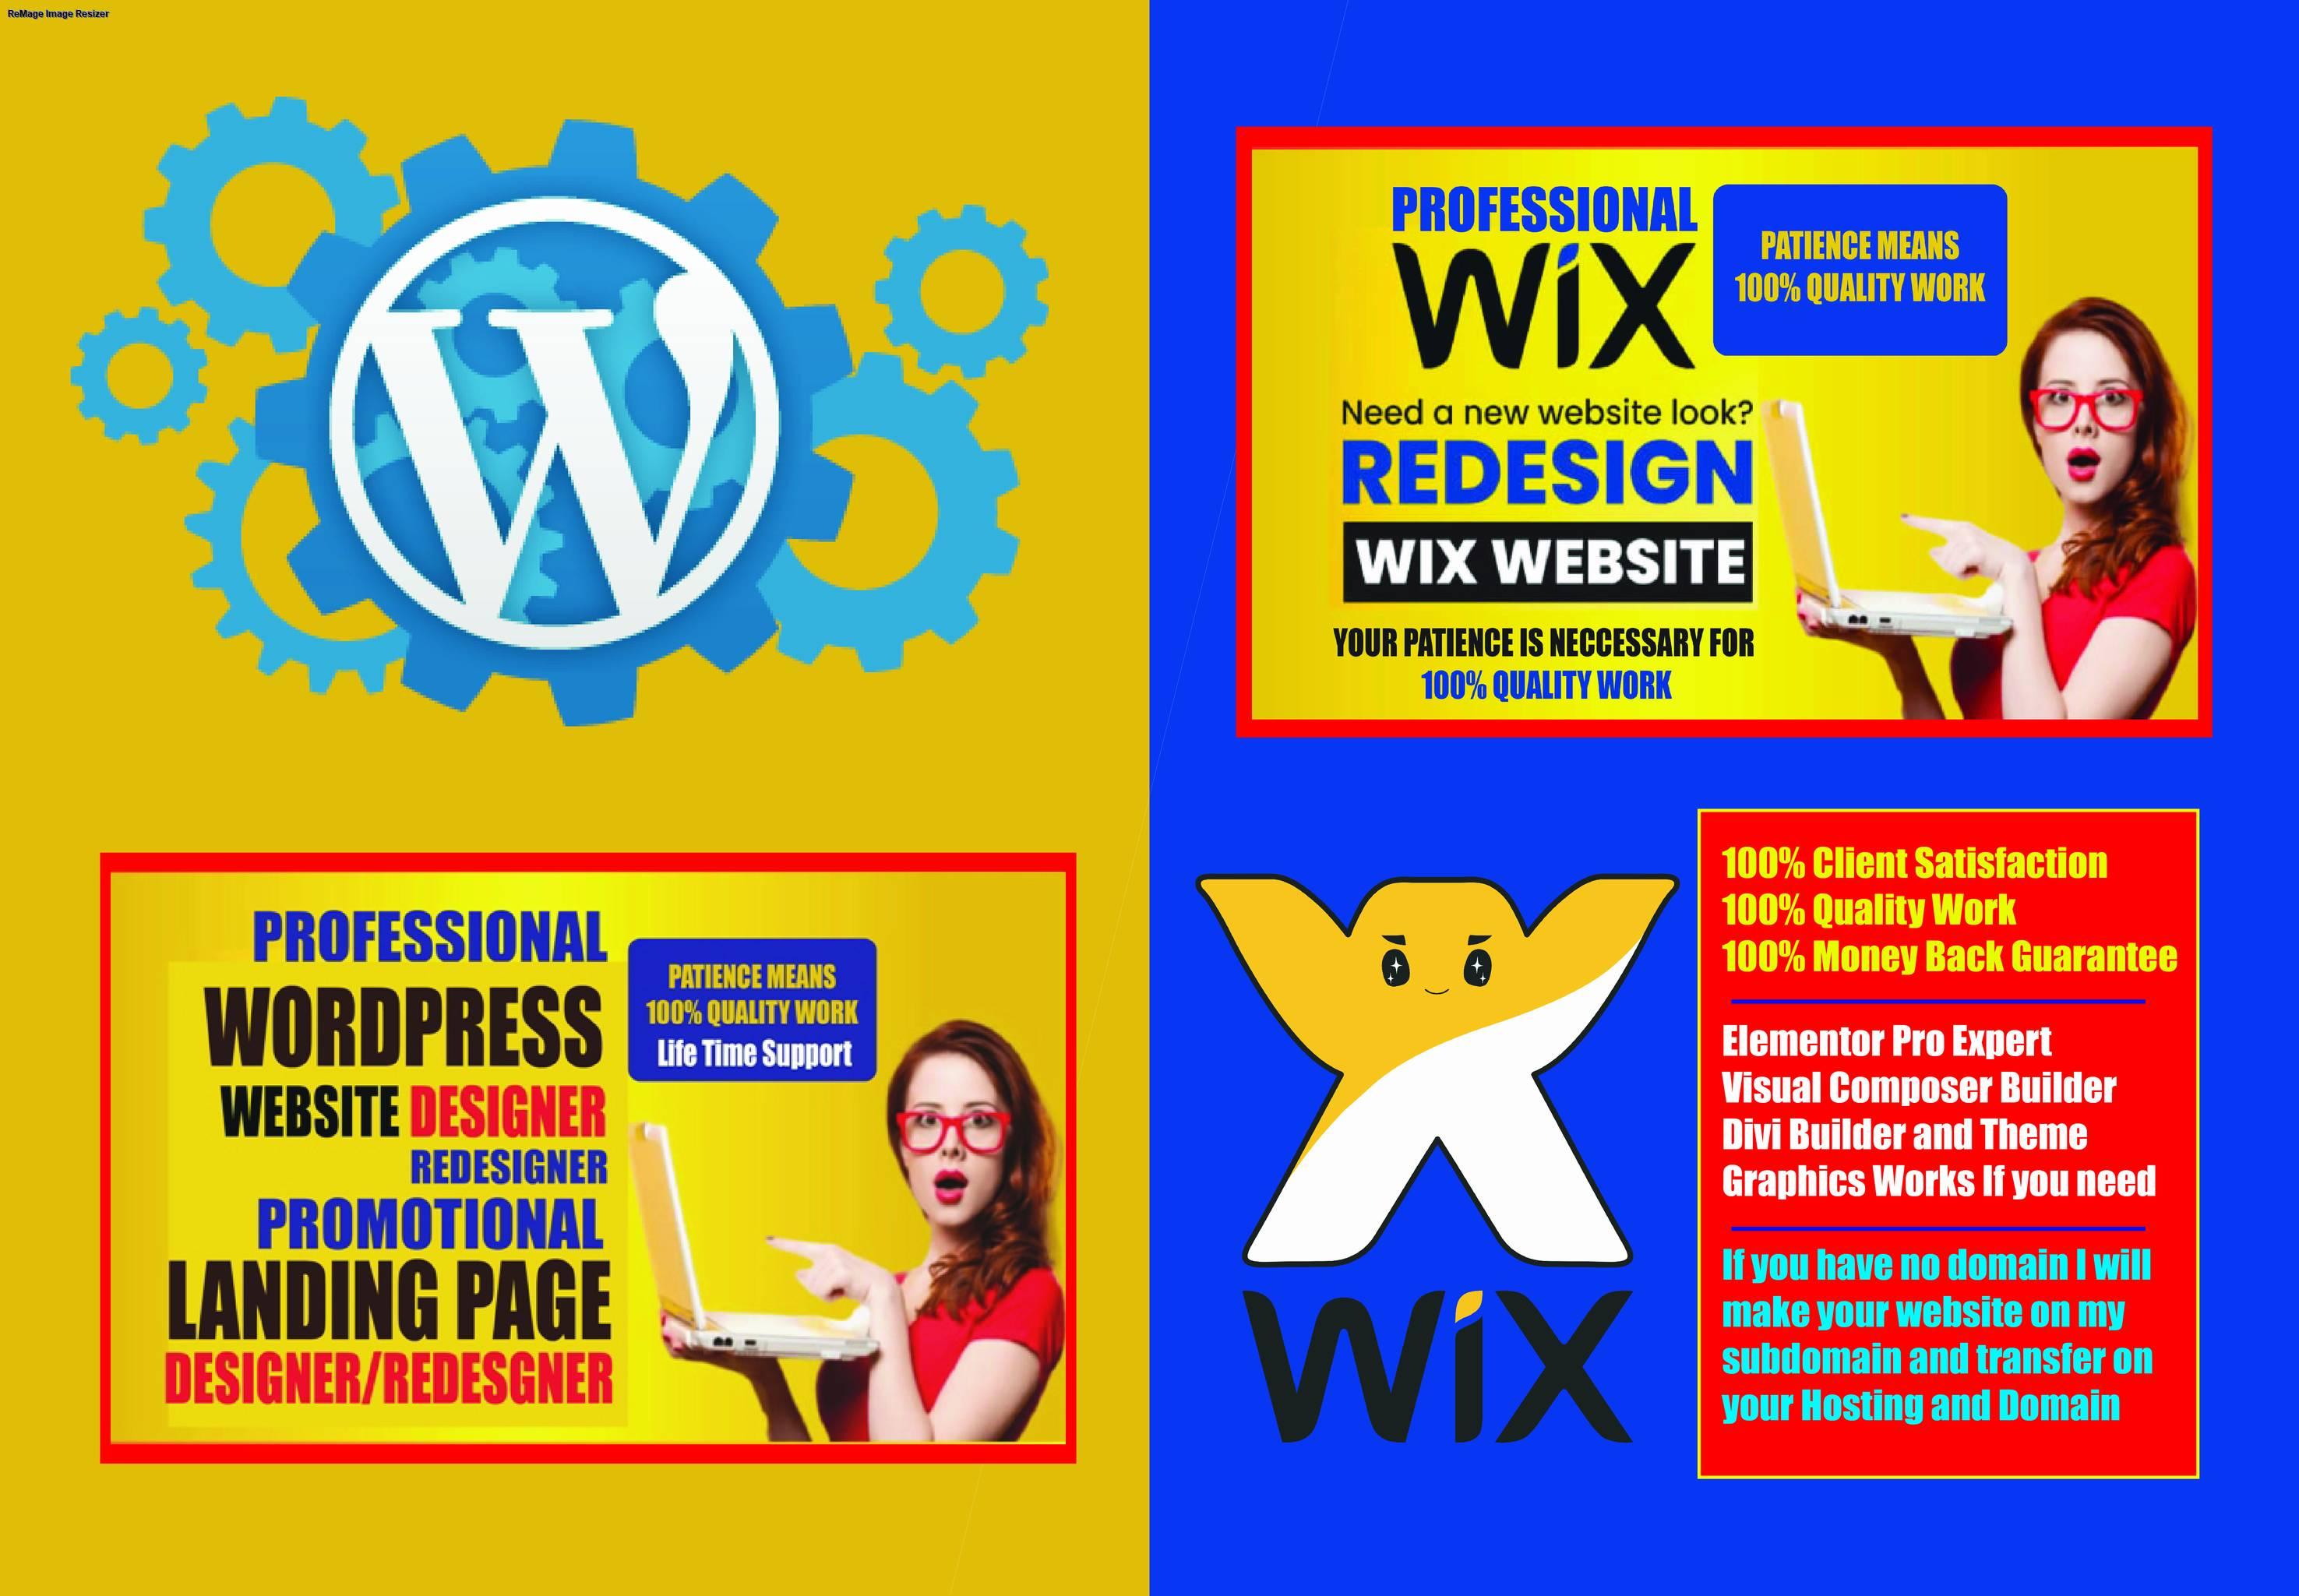 I will design your Custom WordPress website using Elementor Pro